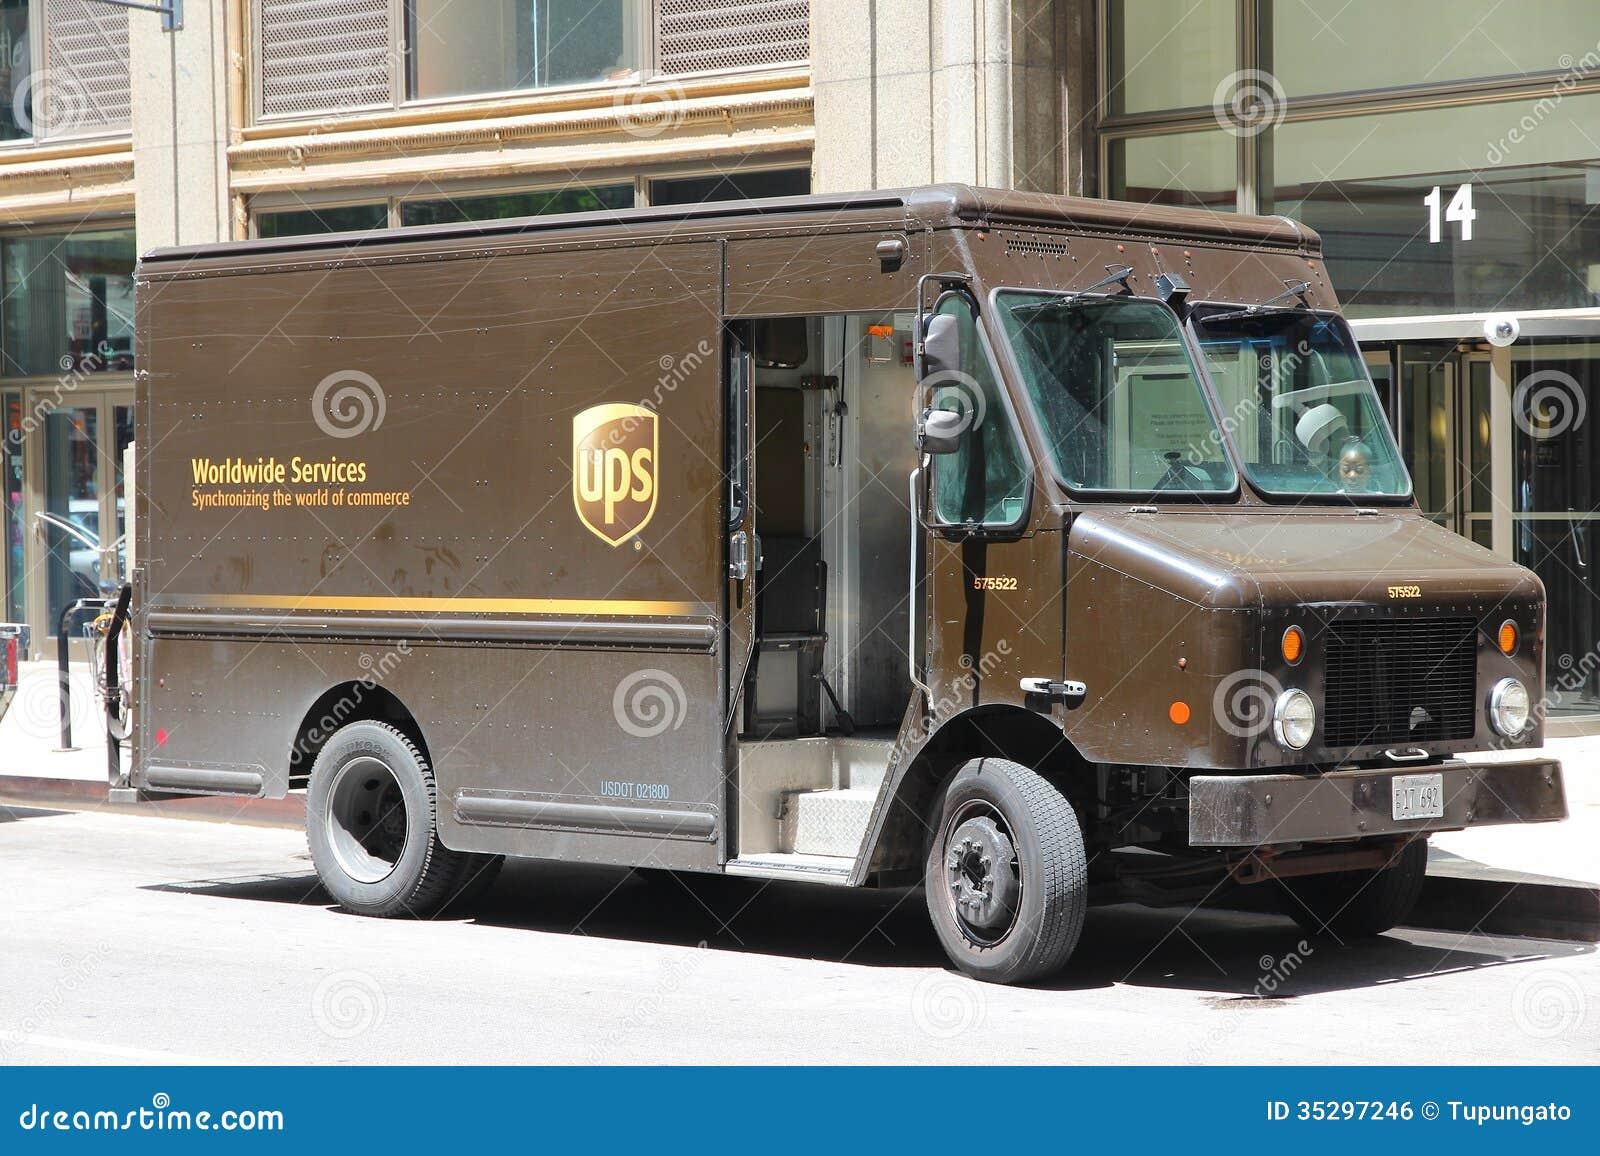 Ups Truck Editorial Photo Image 35297246